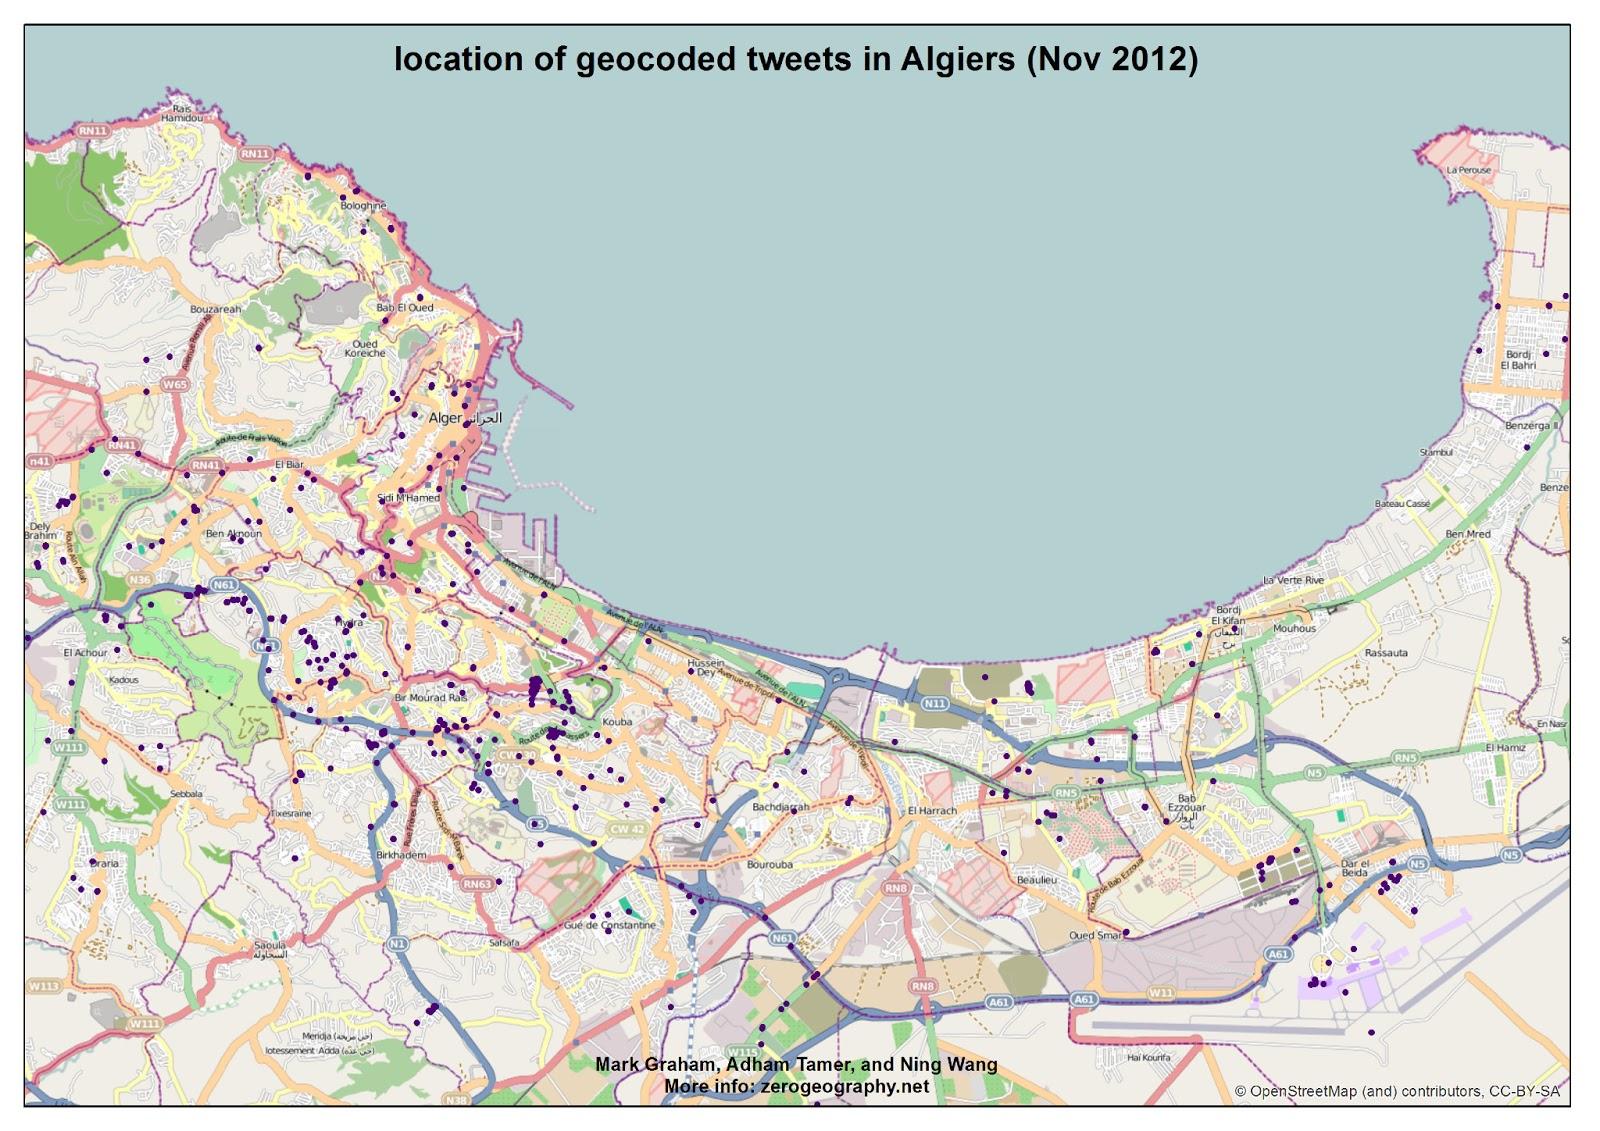 Francophone Africa Map.Mapping Twitter In Francophone Africa Mark Graham